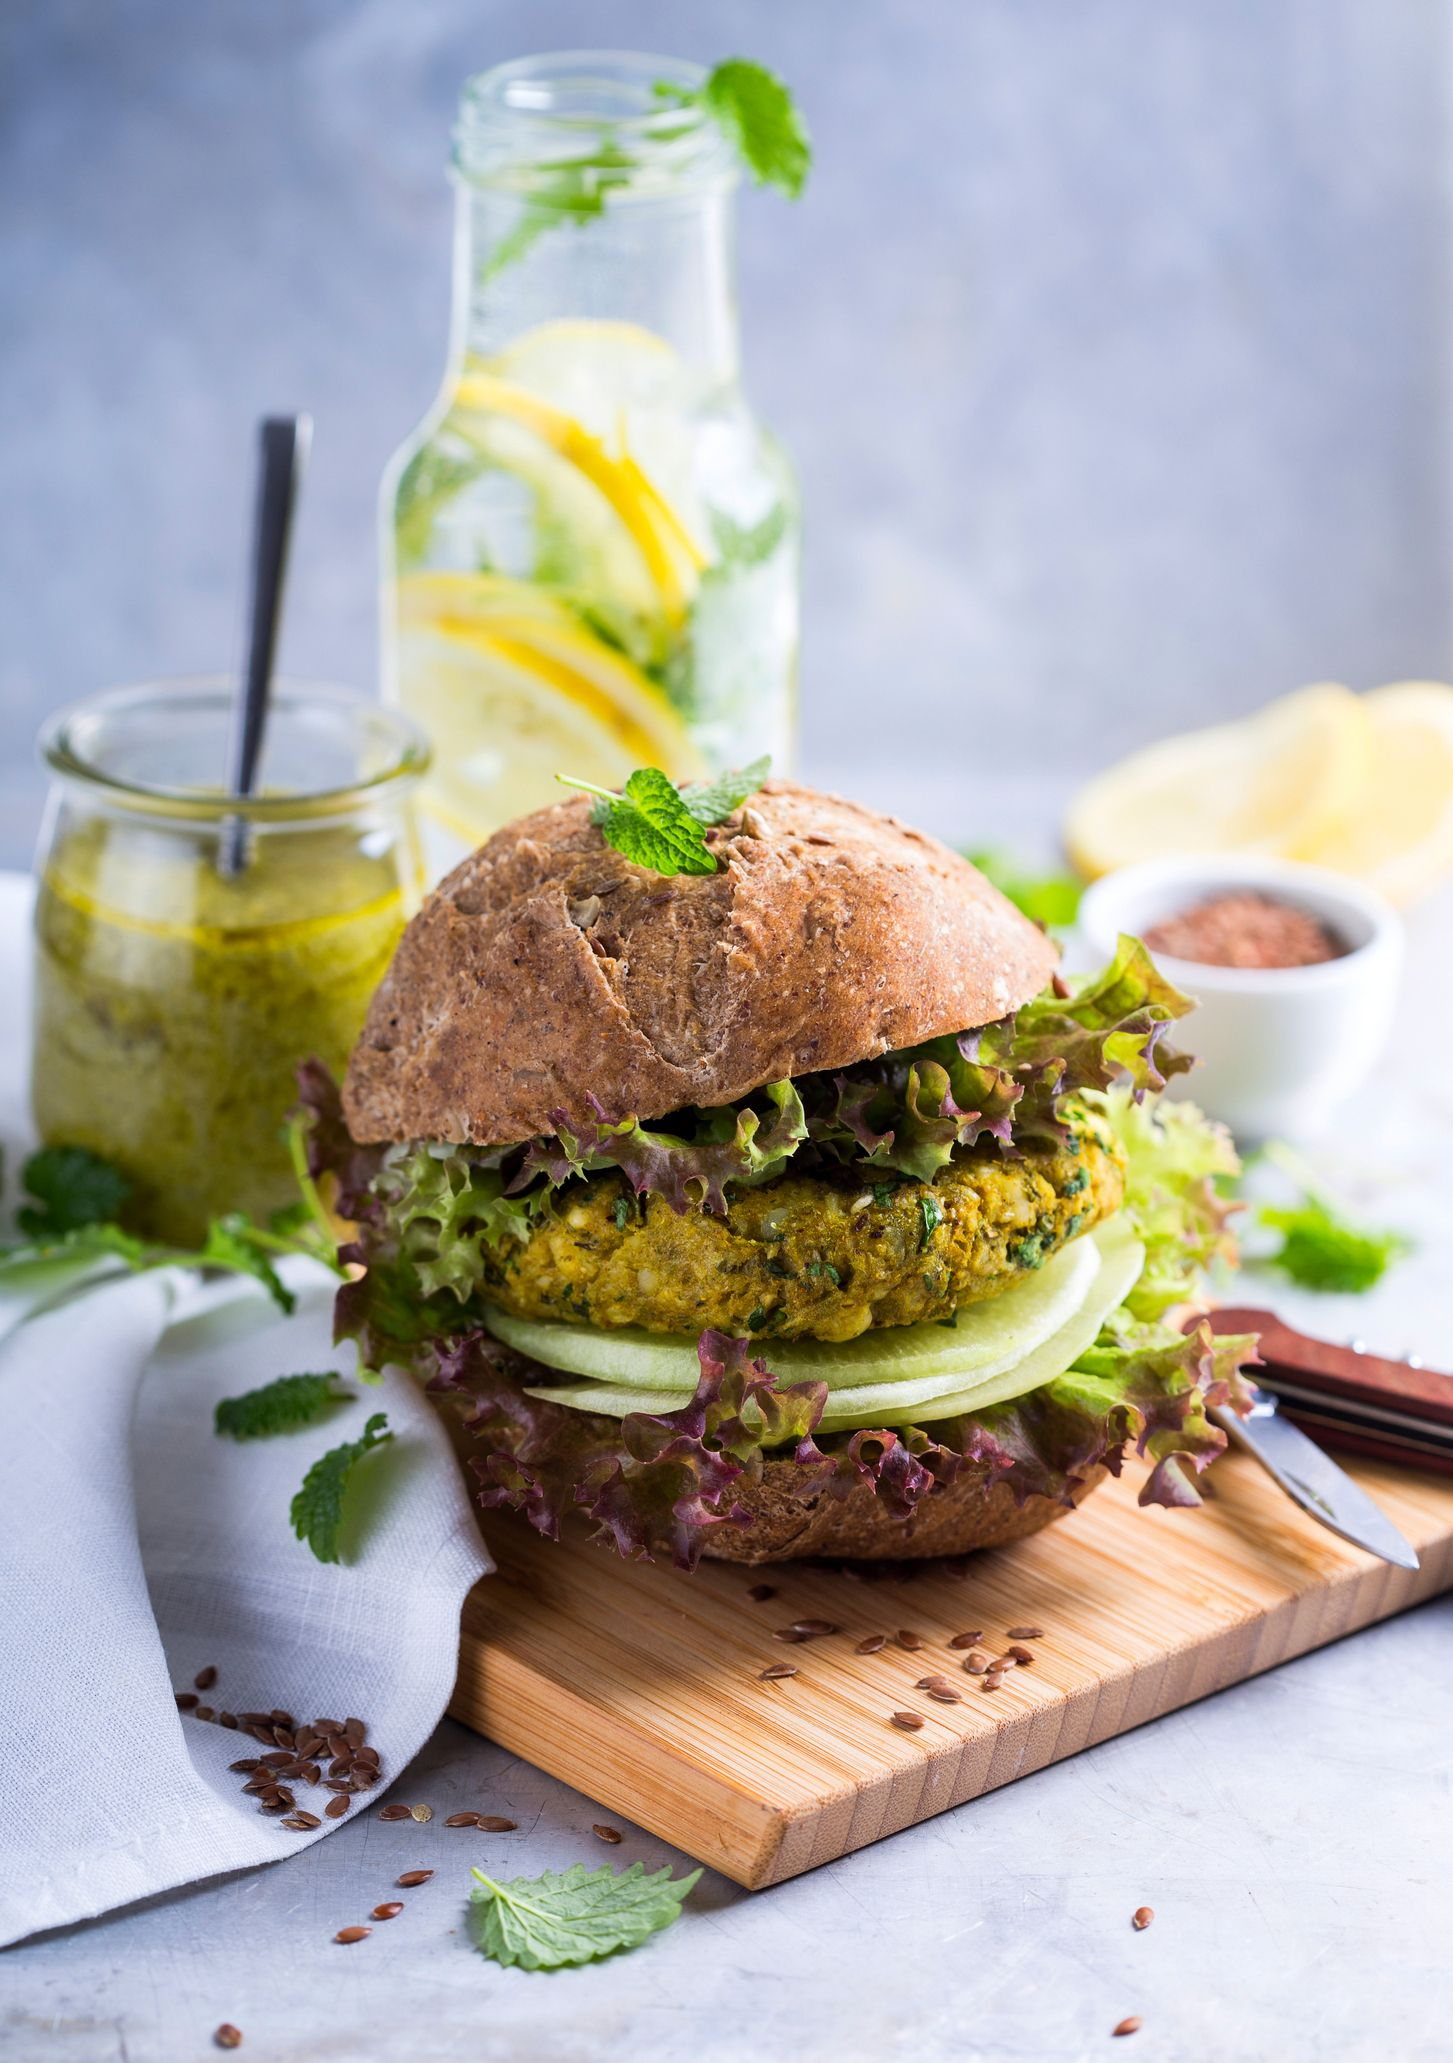 Veggie burgers are trendy! Try them @ AccorHotels ;) #Food #Burger